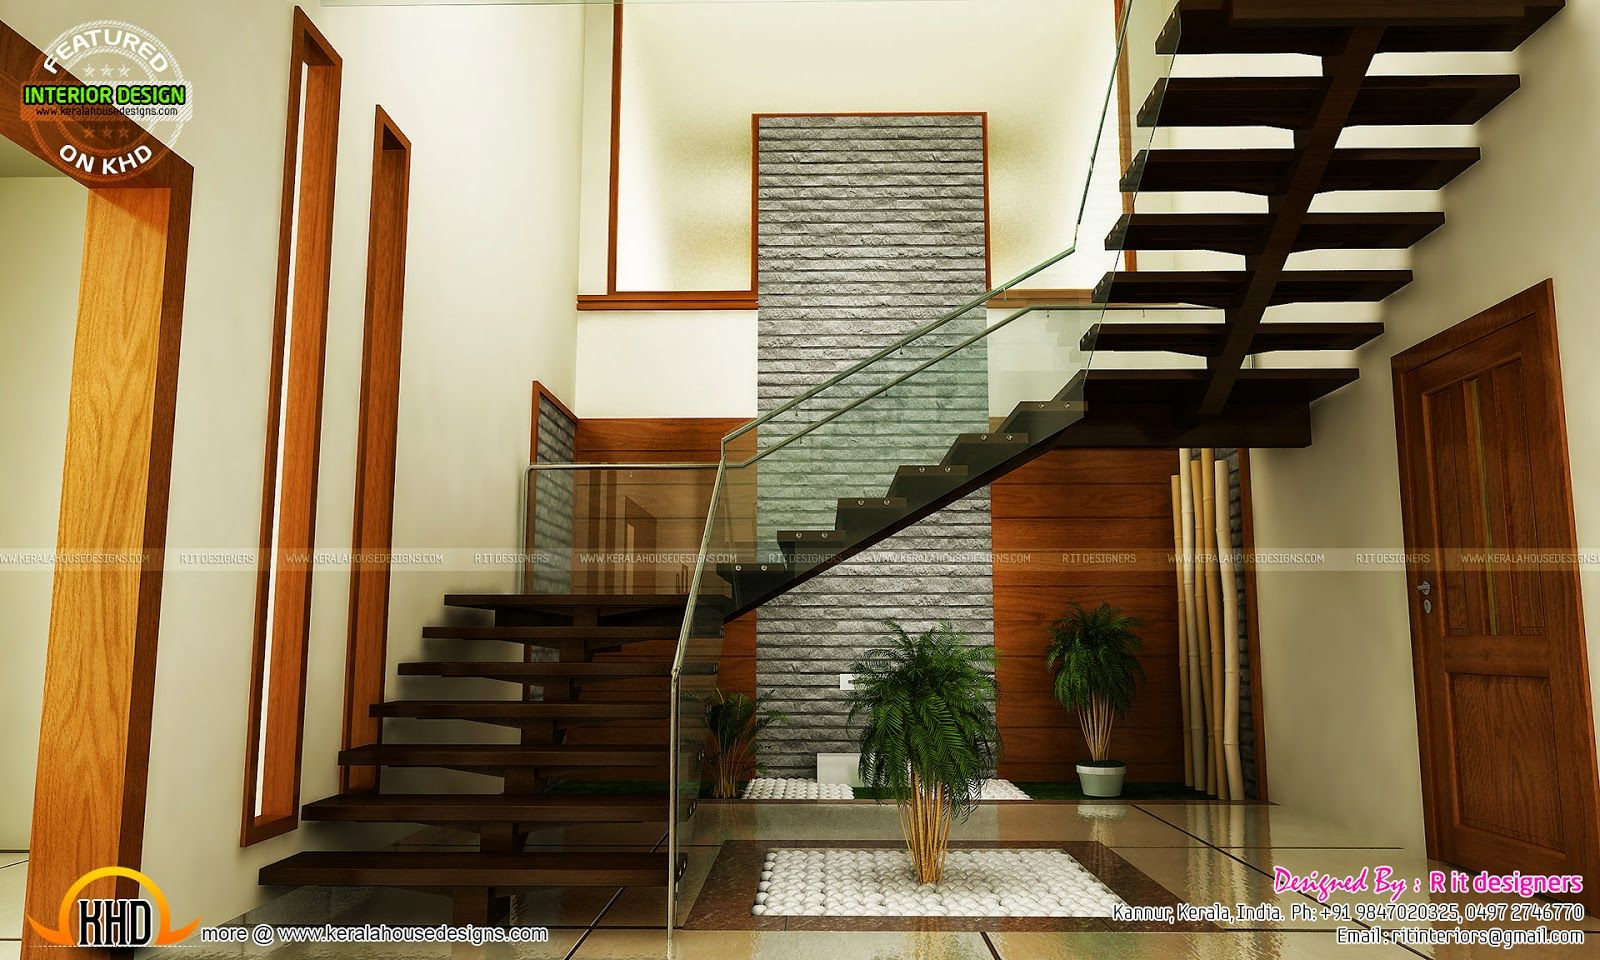 Staircase Bedroom Dining Interiors Kerala Home Design Indian | Staircase Designs For Indian Homes | Granite | New | Beautiful | Cheap | Steel